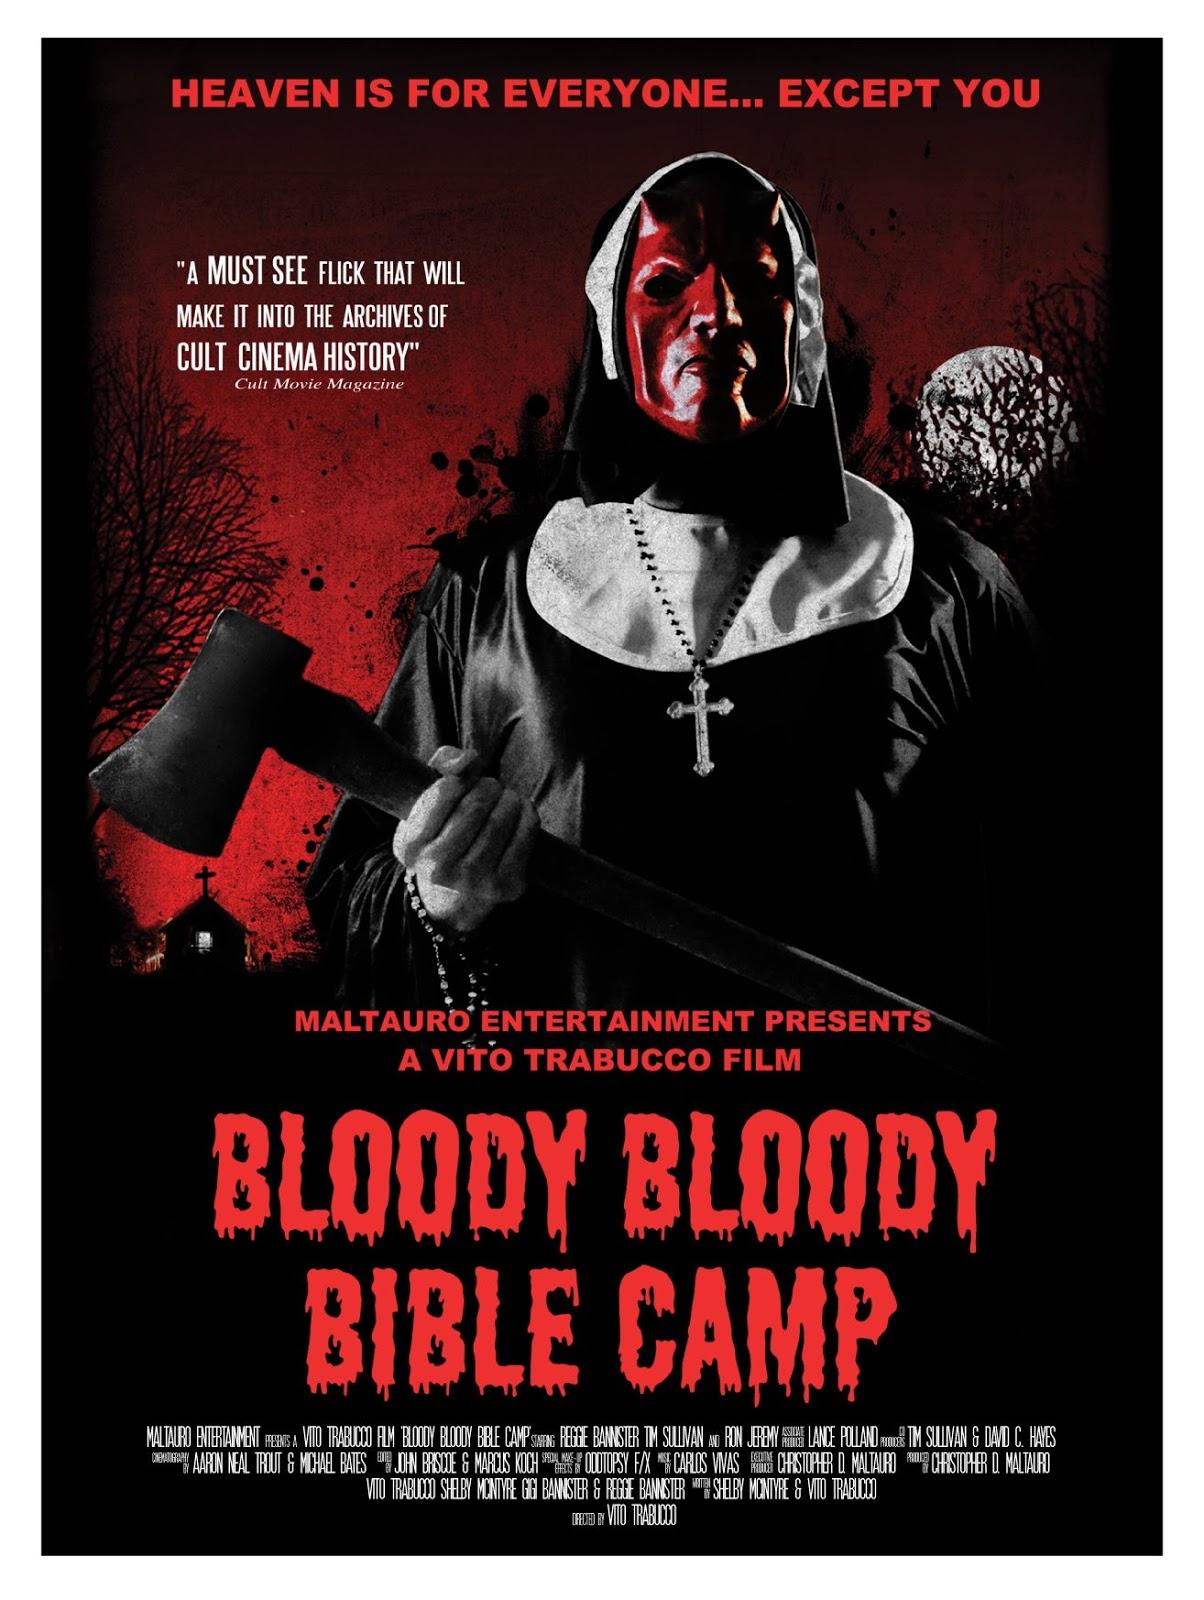 http://3.bp.blogspot.com/-EUcCzm-nOIA/UHgt4M7rSFI/AAAAAAAAAL0/4-WXWBckO0s/s1600/bloody-bloody-bible-camp-poster.jpg